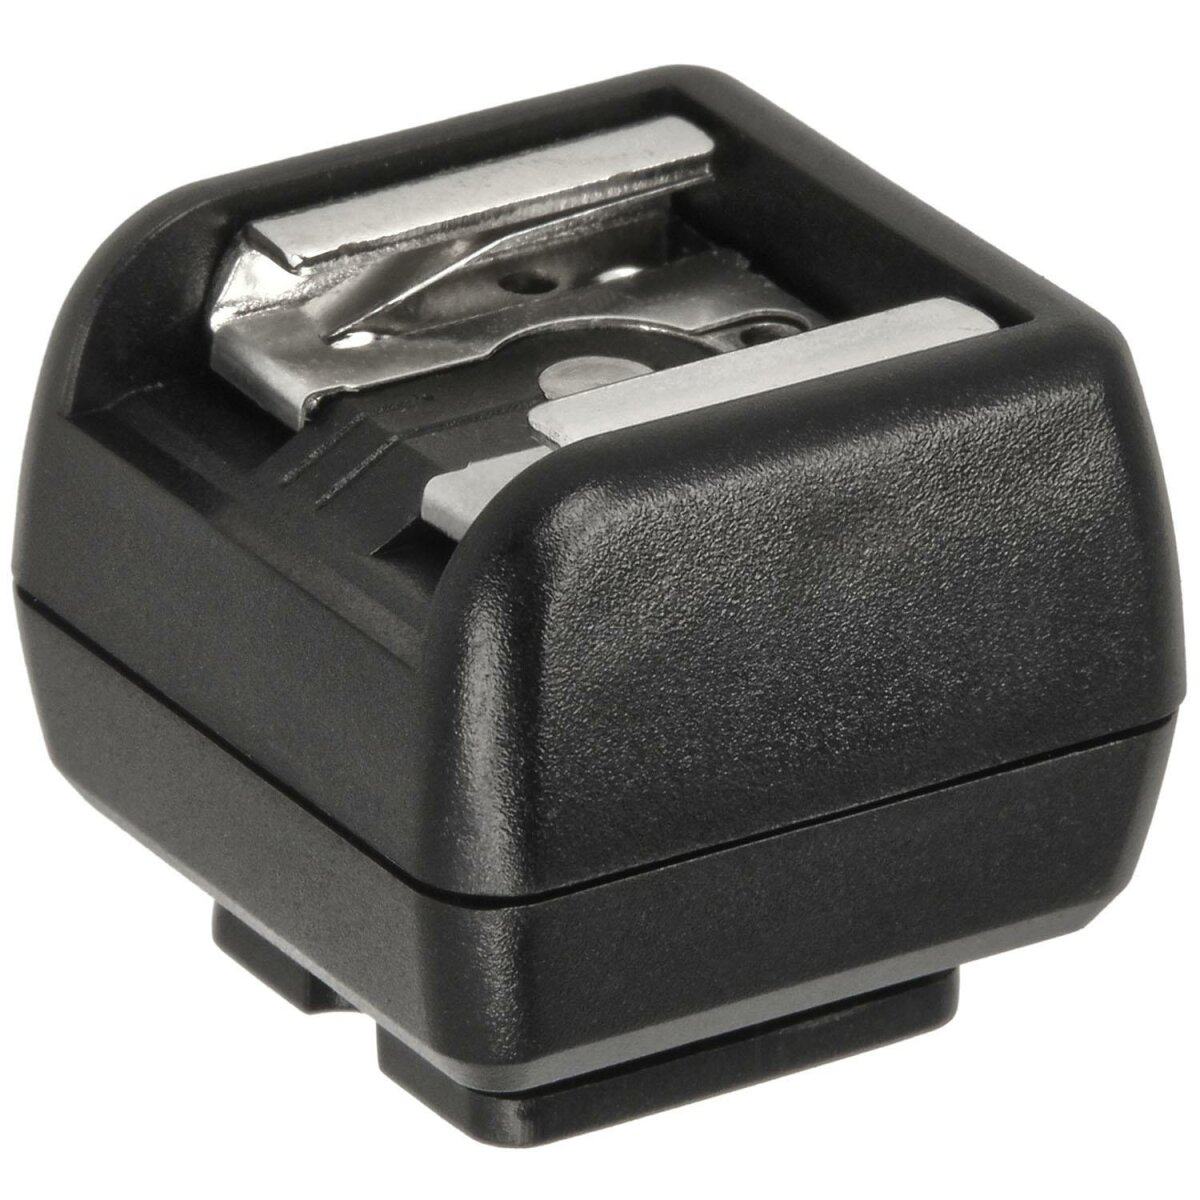 Impulsfoto JJC Hot Shoe Flash-Adapter mit PC-Synchronisationsbuchse | Für tragbare Blitzgeräte an DSLRs | Standard ISO-518-Blitzschuh-Adapter - Standard ISO-518-Fuß - PC-Sync | JSC-2